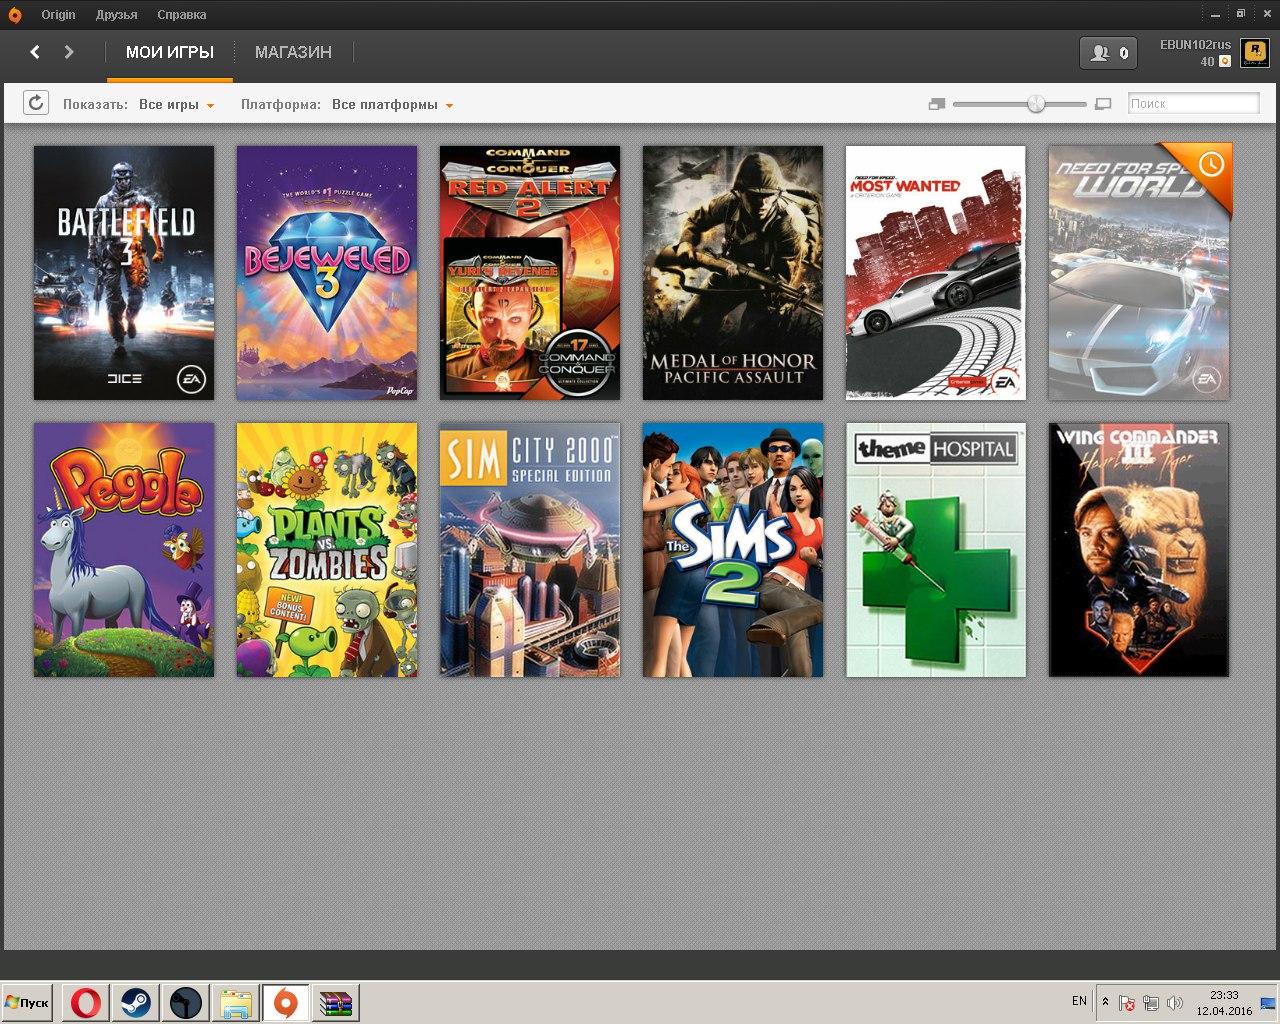 2 Аккаунта Uplay и Origin с играми: Assassin's Creed 3 и Battlefield 3